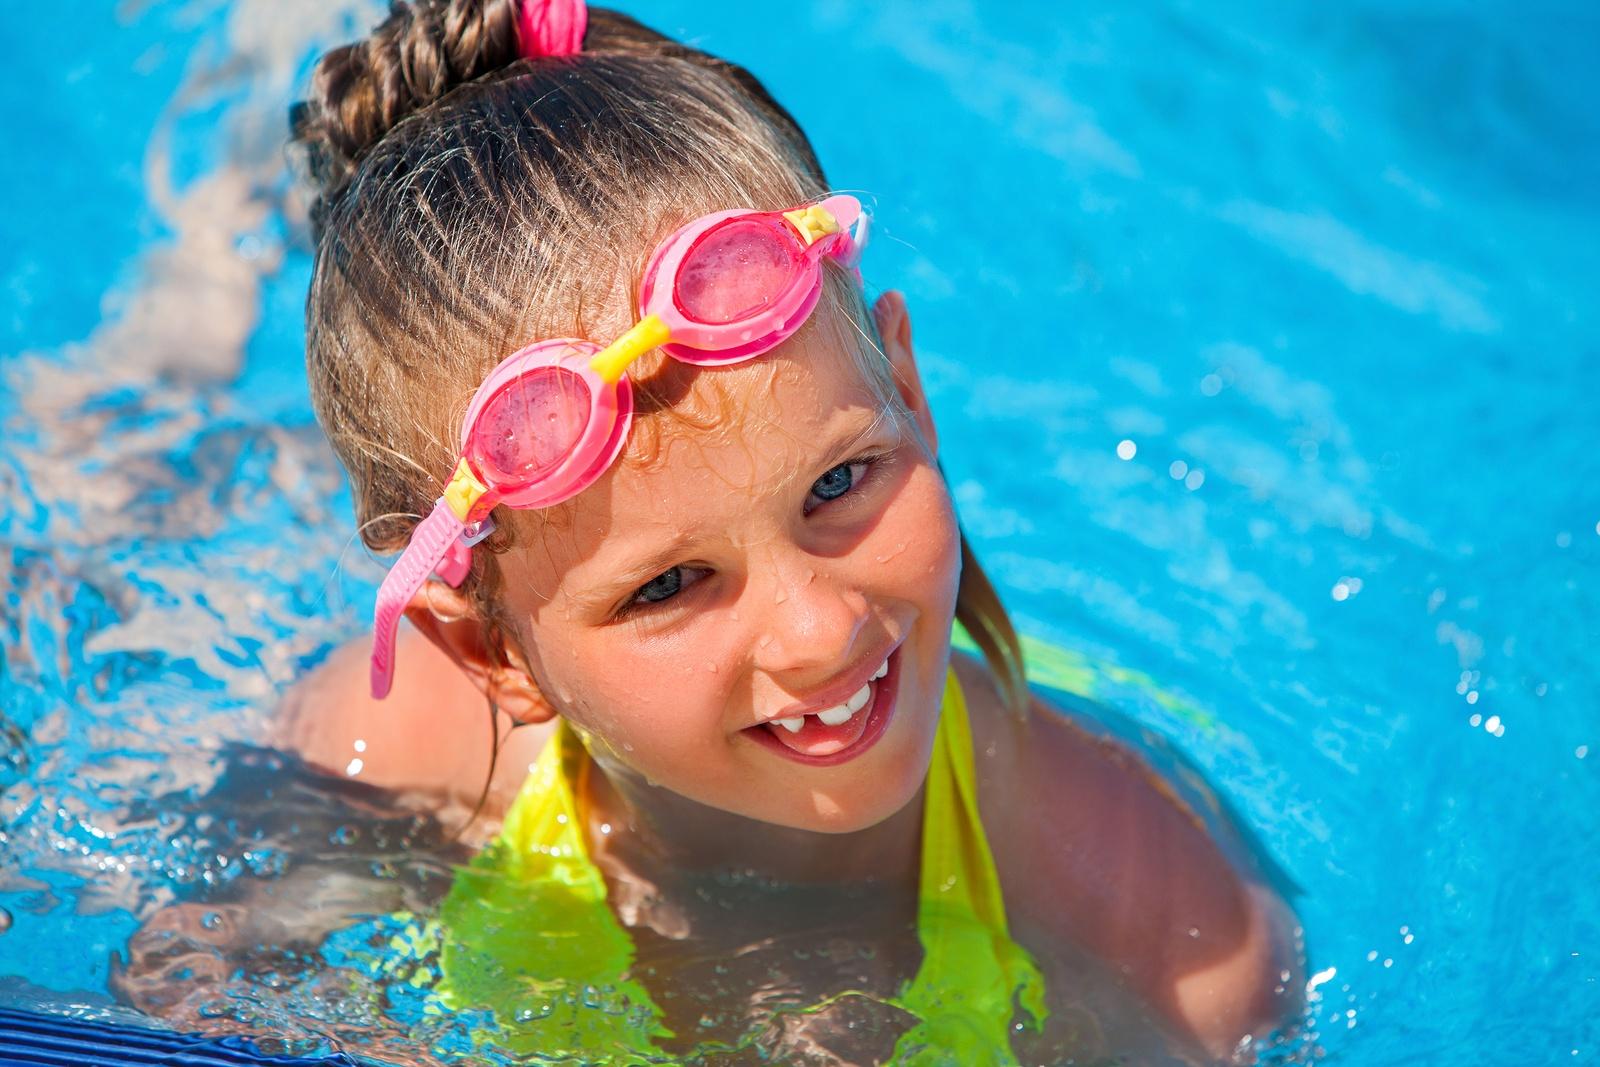 bigstock-Portrait-of-child-girl-wearing-129133820.jpg